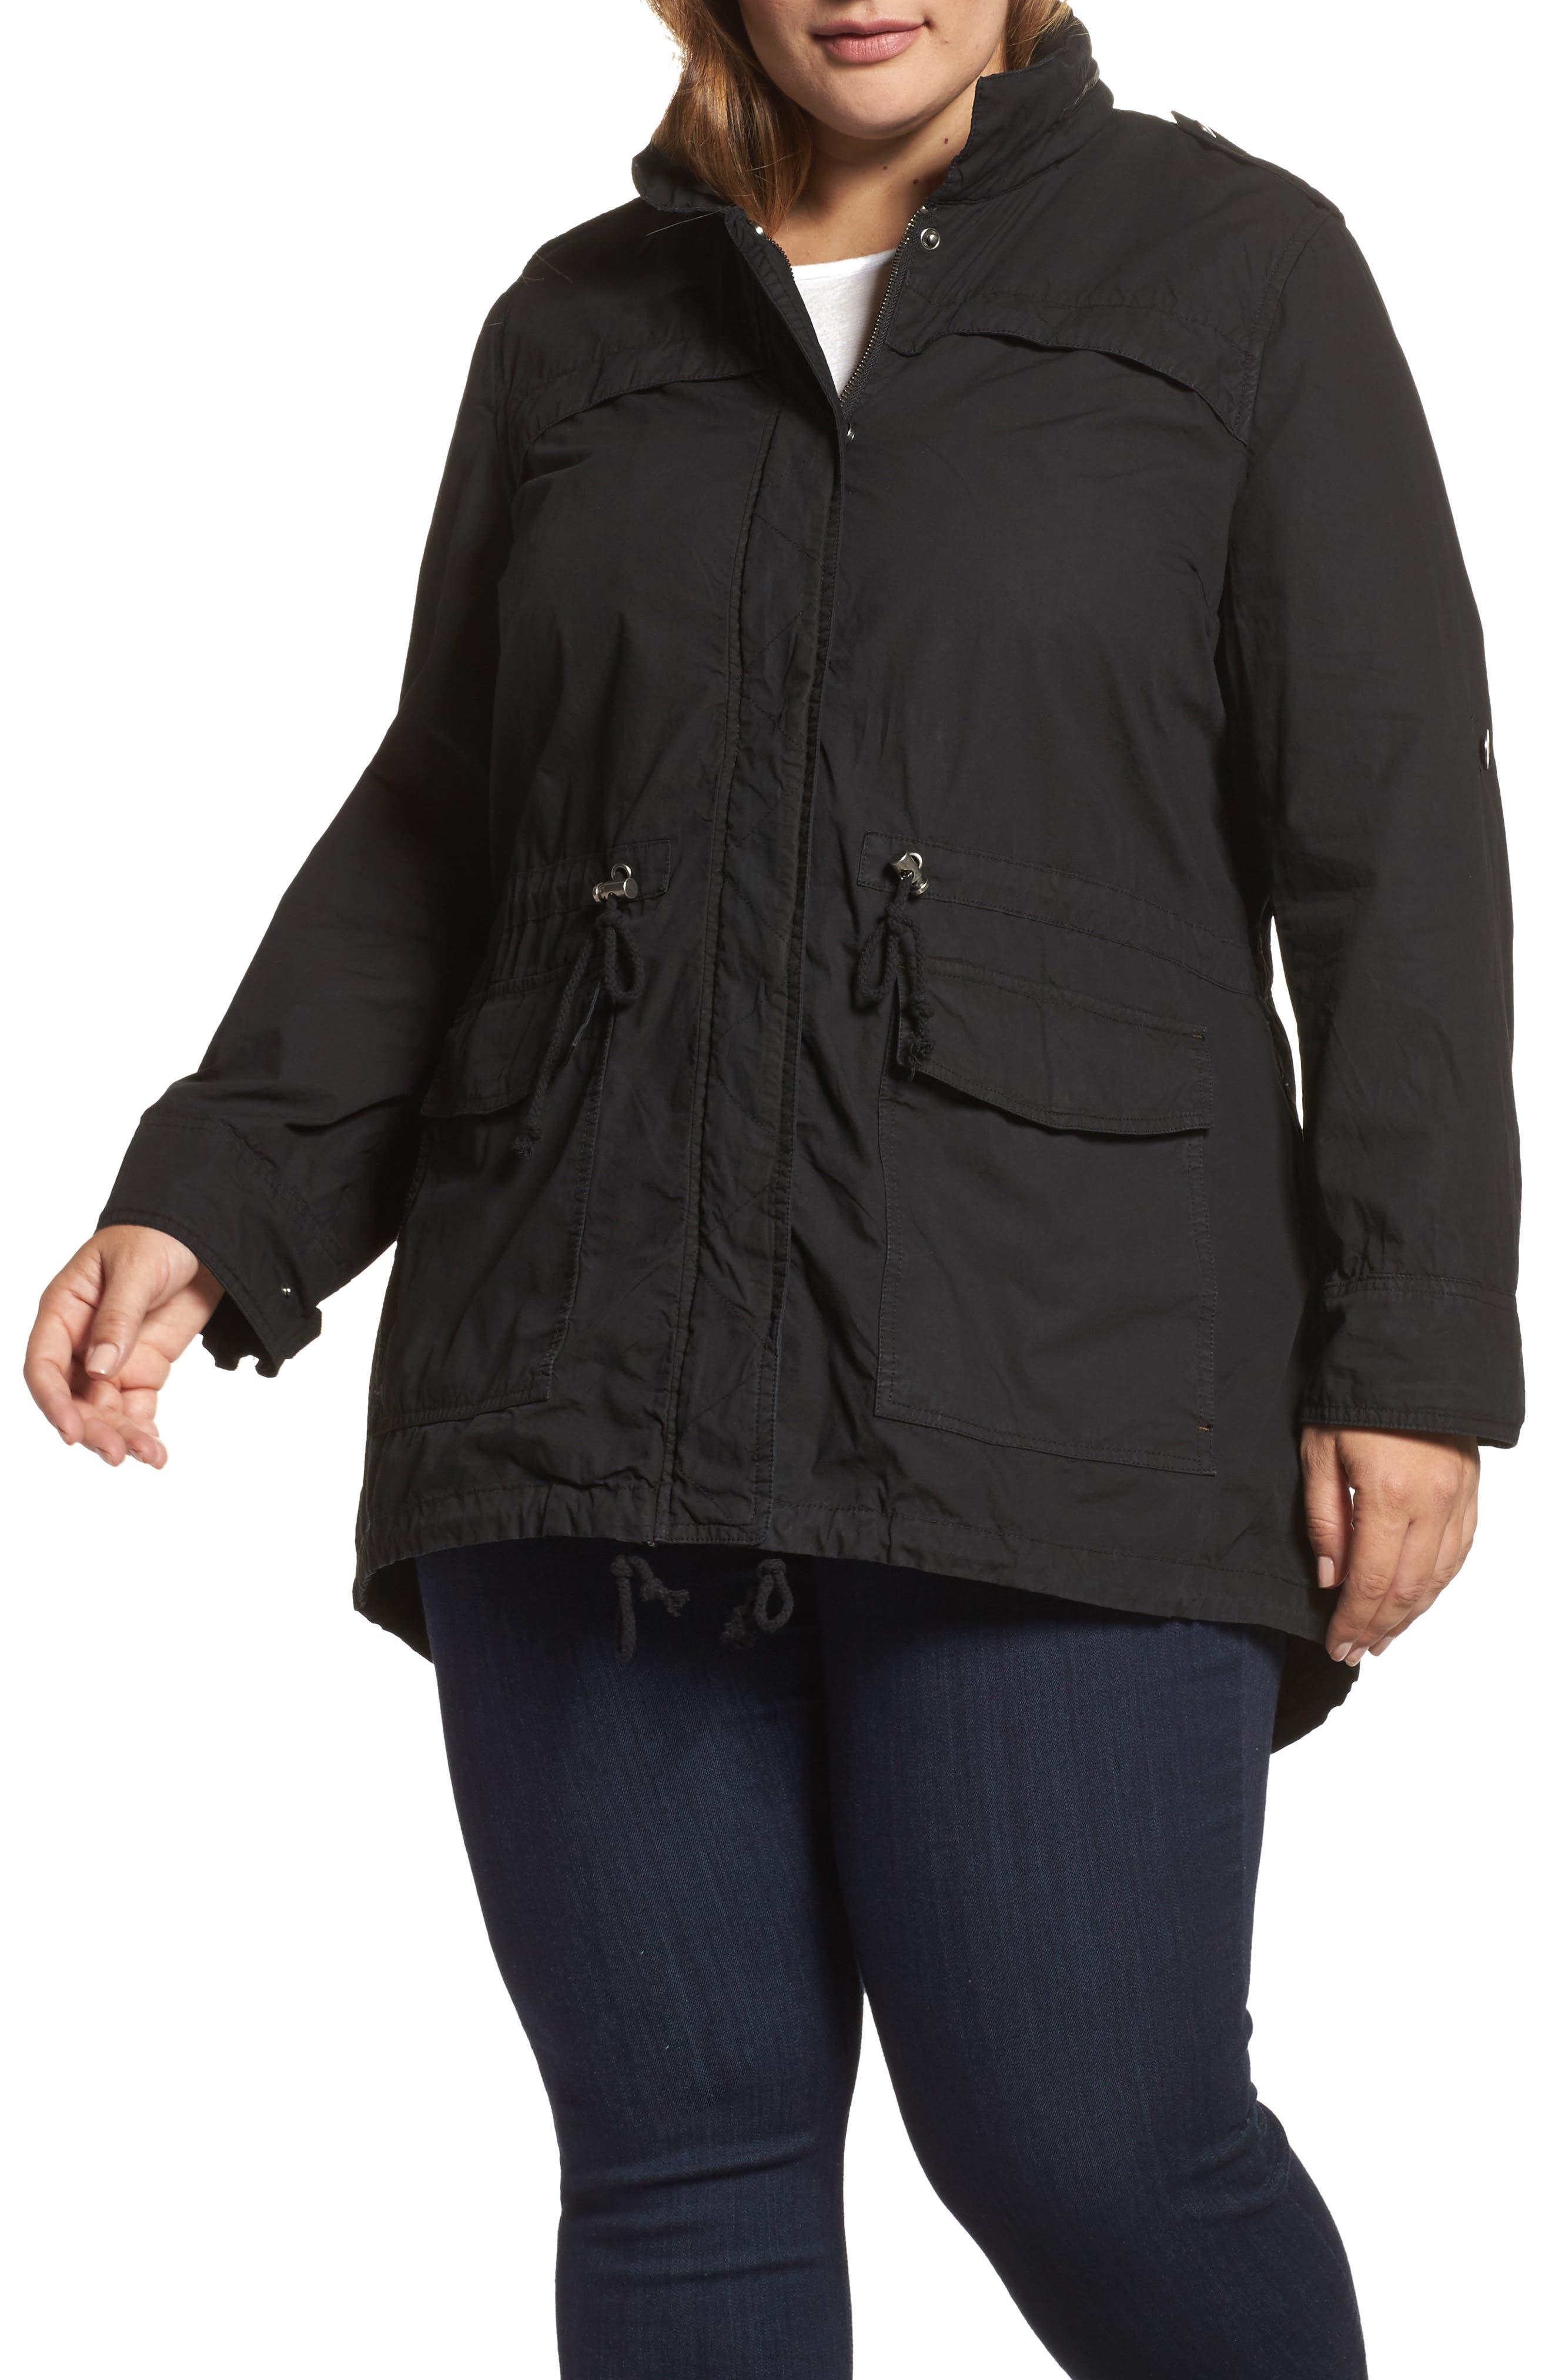 Parachute Hooded Cotton Utility Jacket,                         Main,                         color,